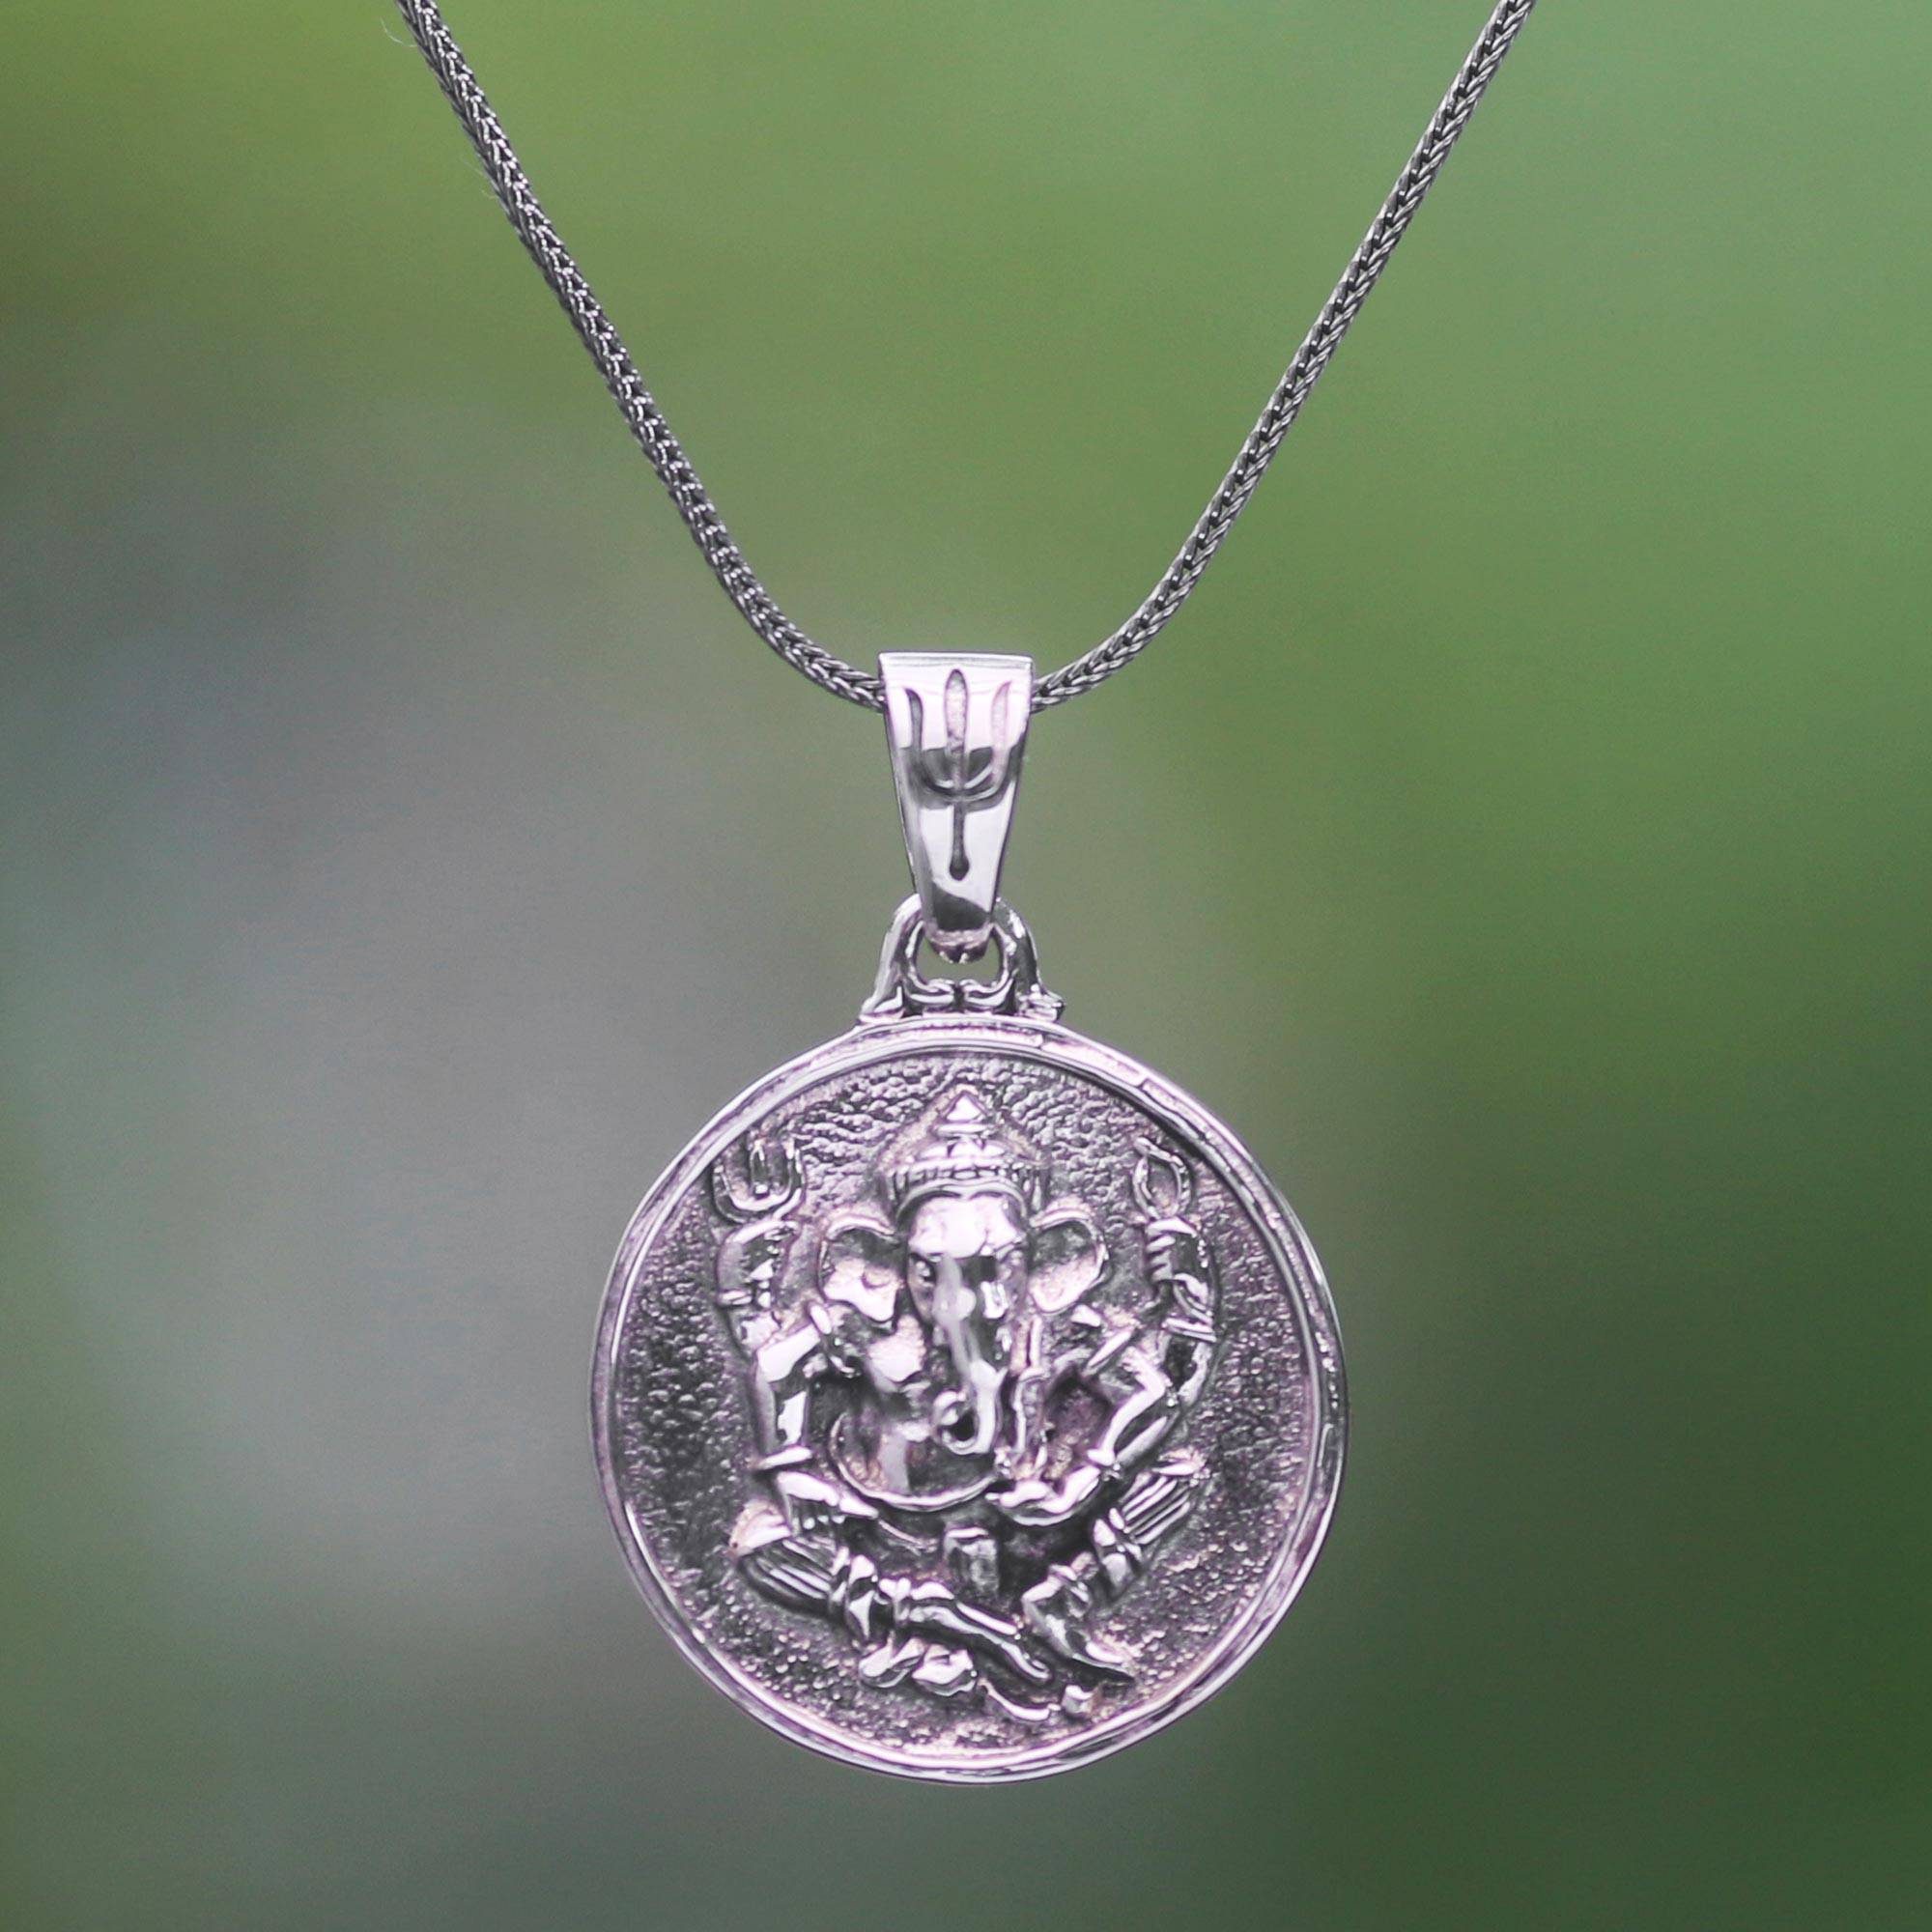 4ea3b01df Unicef UK Market | Sterling Silver Hindu Pendant Necklace - Gracious ...